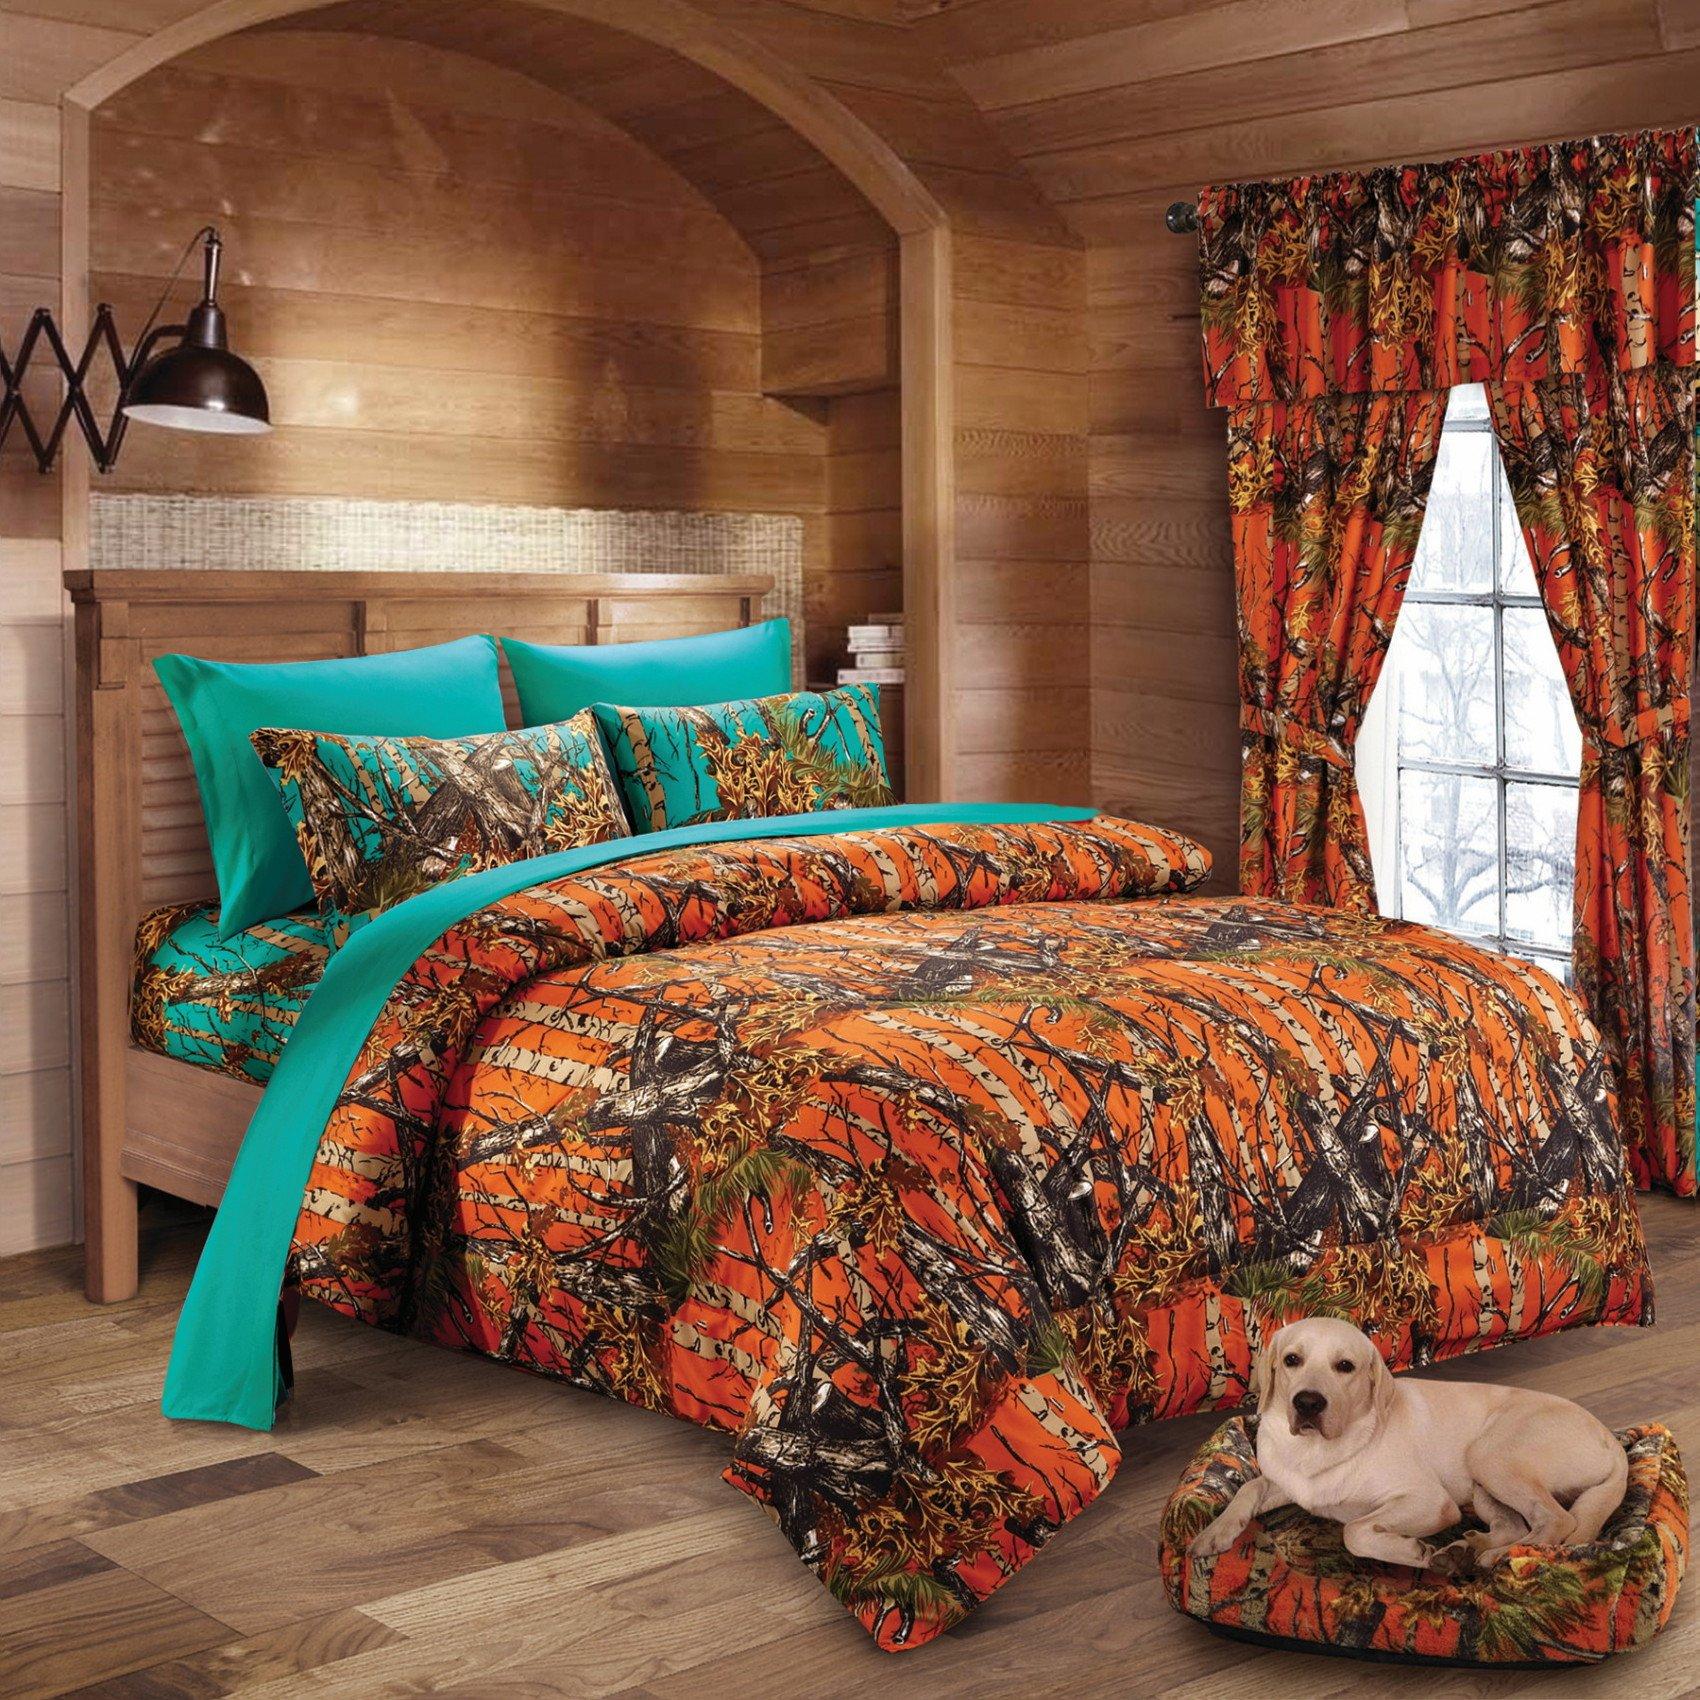 20 Lakes Hunter Camo Comforter, Sheet, Pillowcase Set (Full, Orange & Teal)